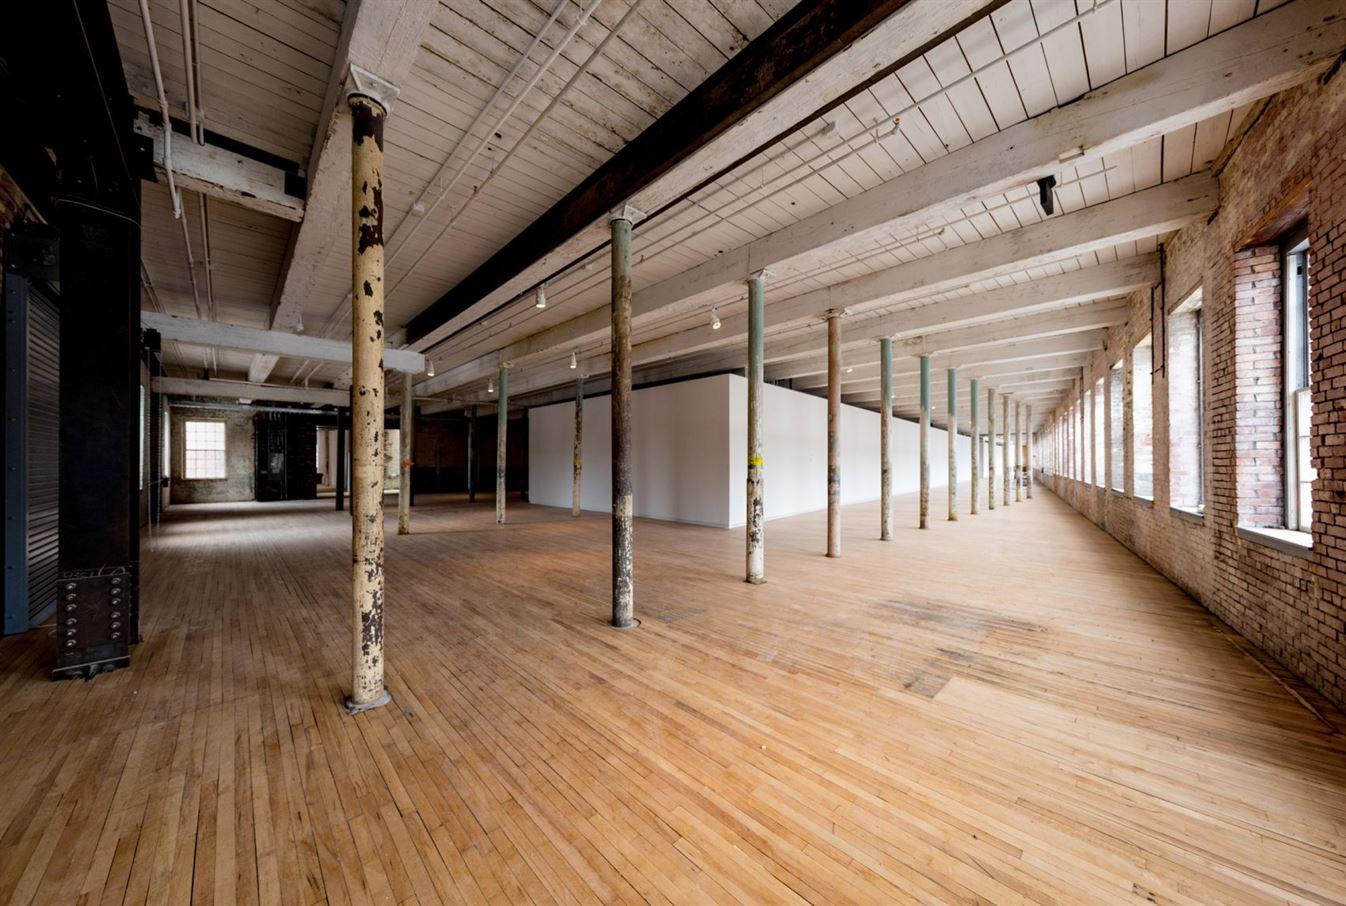 bruner-cott-mass-moca-massachusetts-museum-of-contemporary-art-museum-textile-factory-berkshires-expans5555ion-renovation_dezeen_4-1704